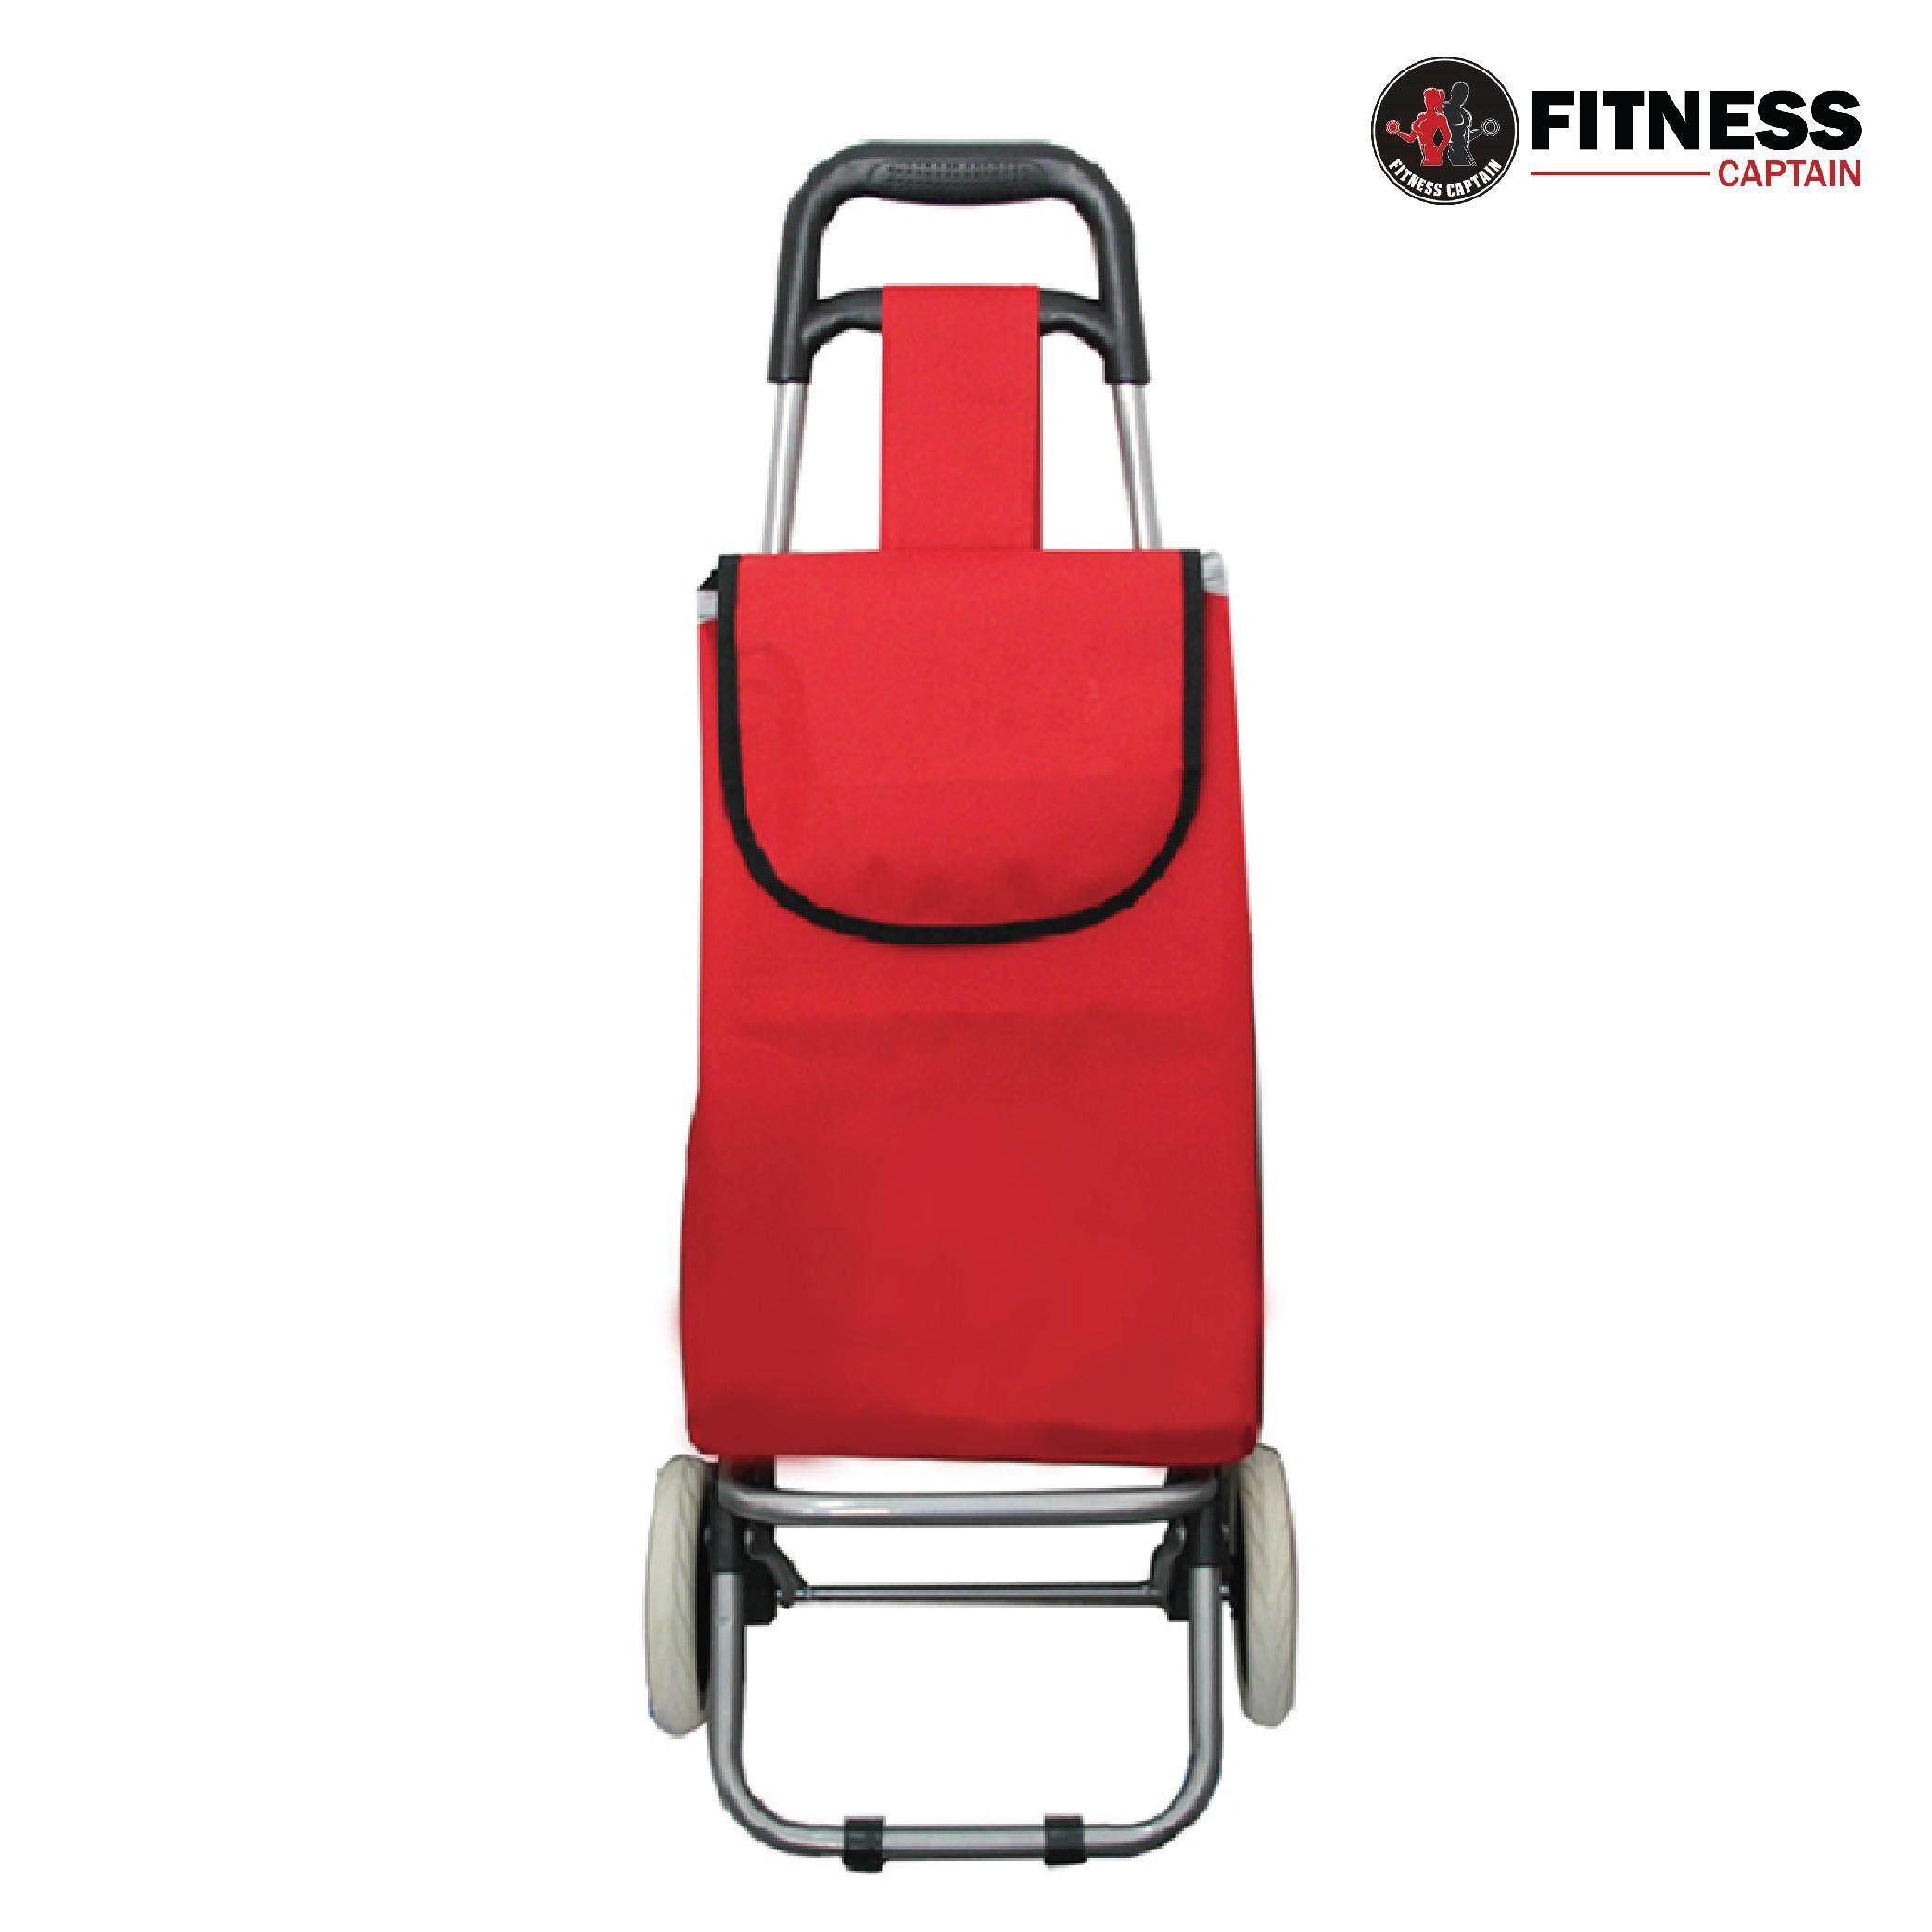 06260980997e Shopping Trolley Push Cart Foldable Wheel Multi Functional Luggage Bag